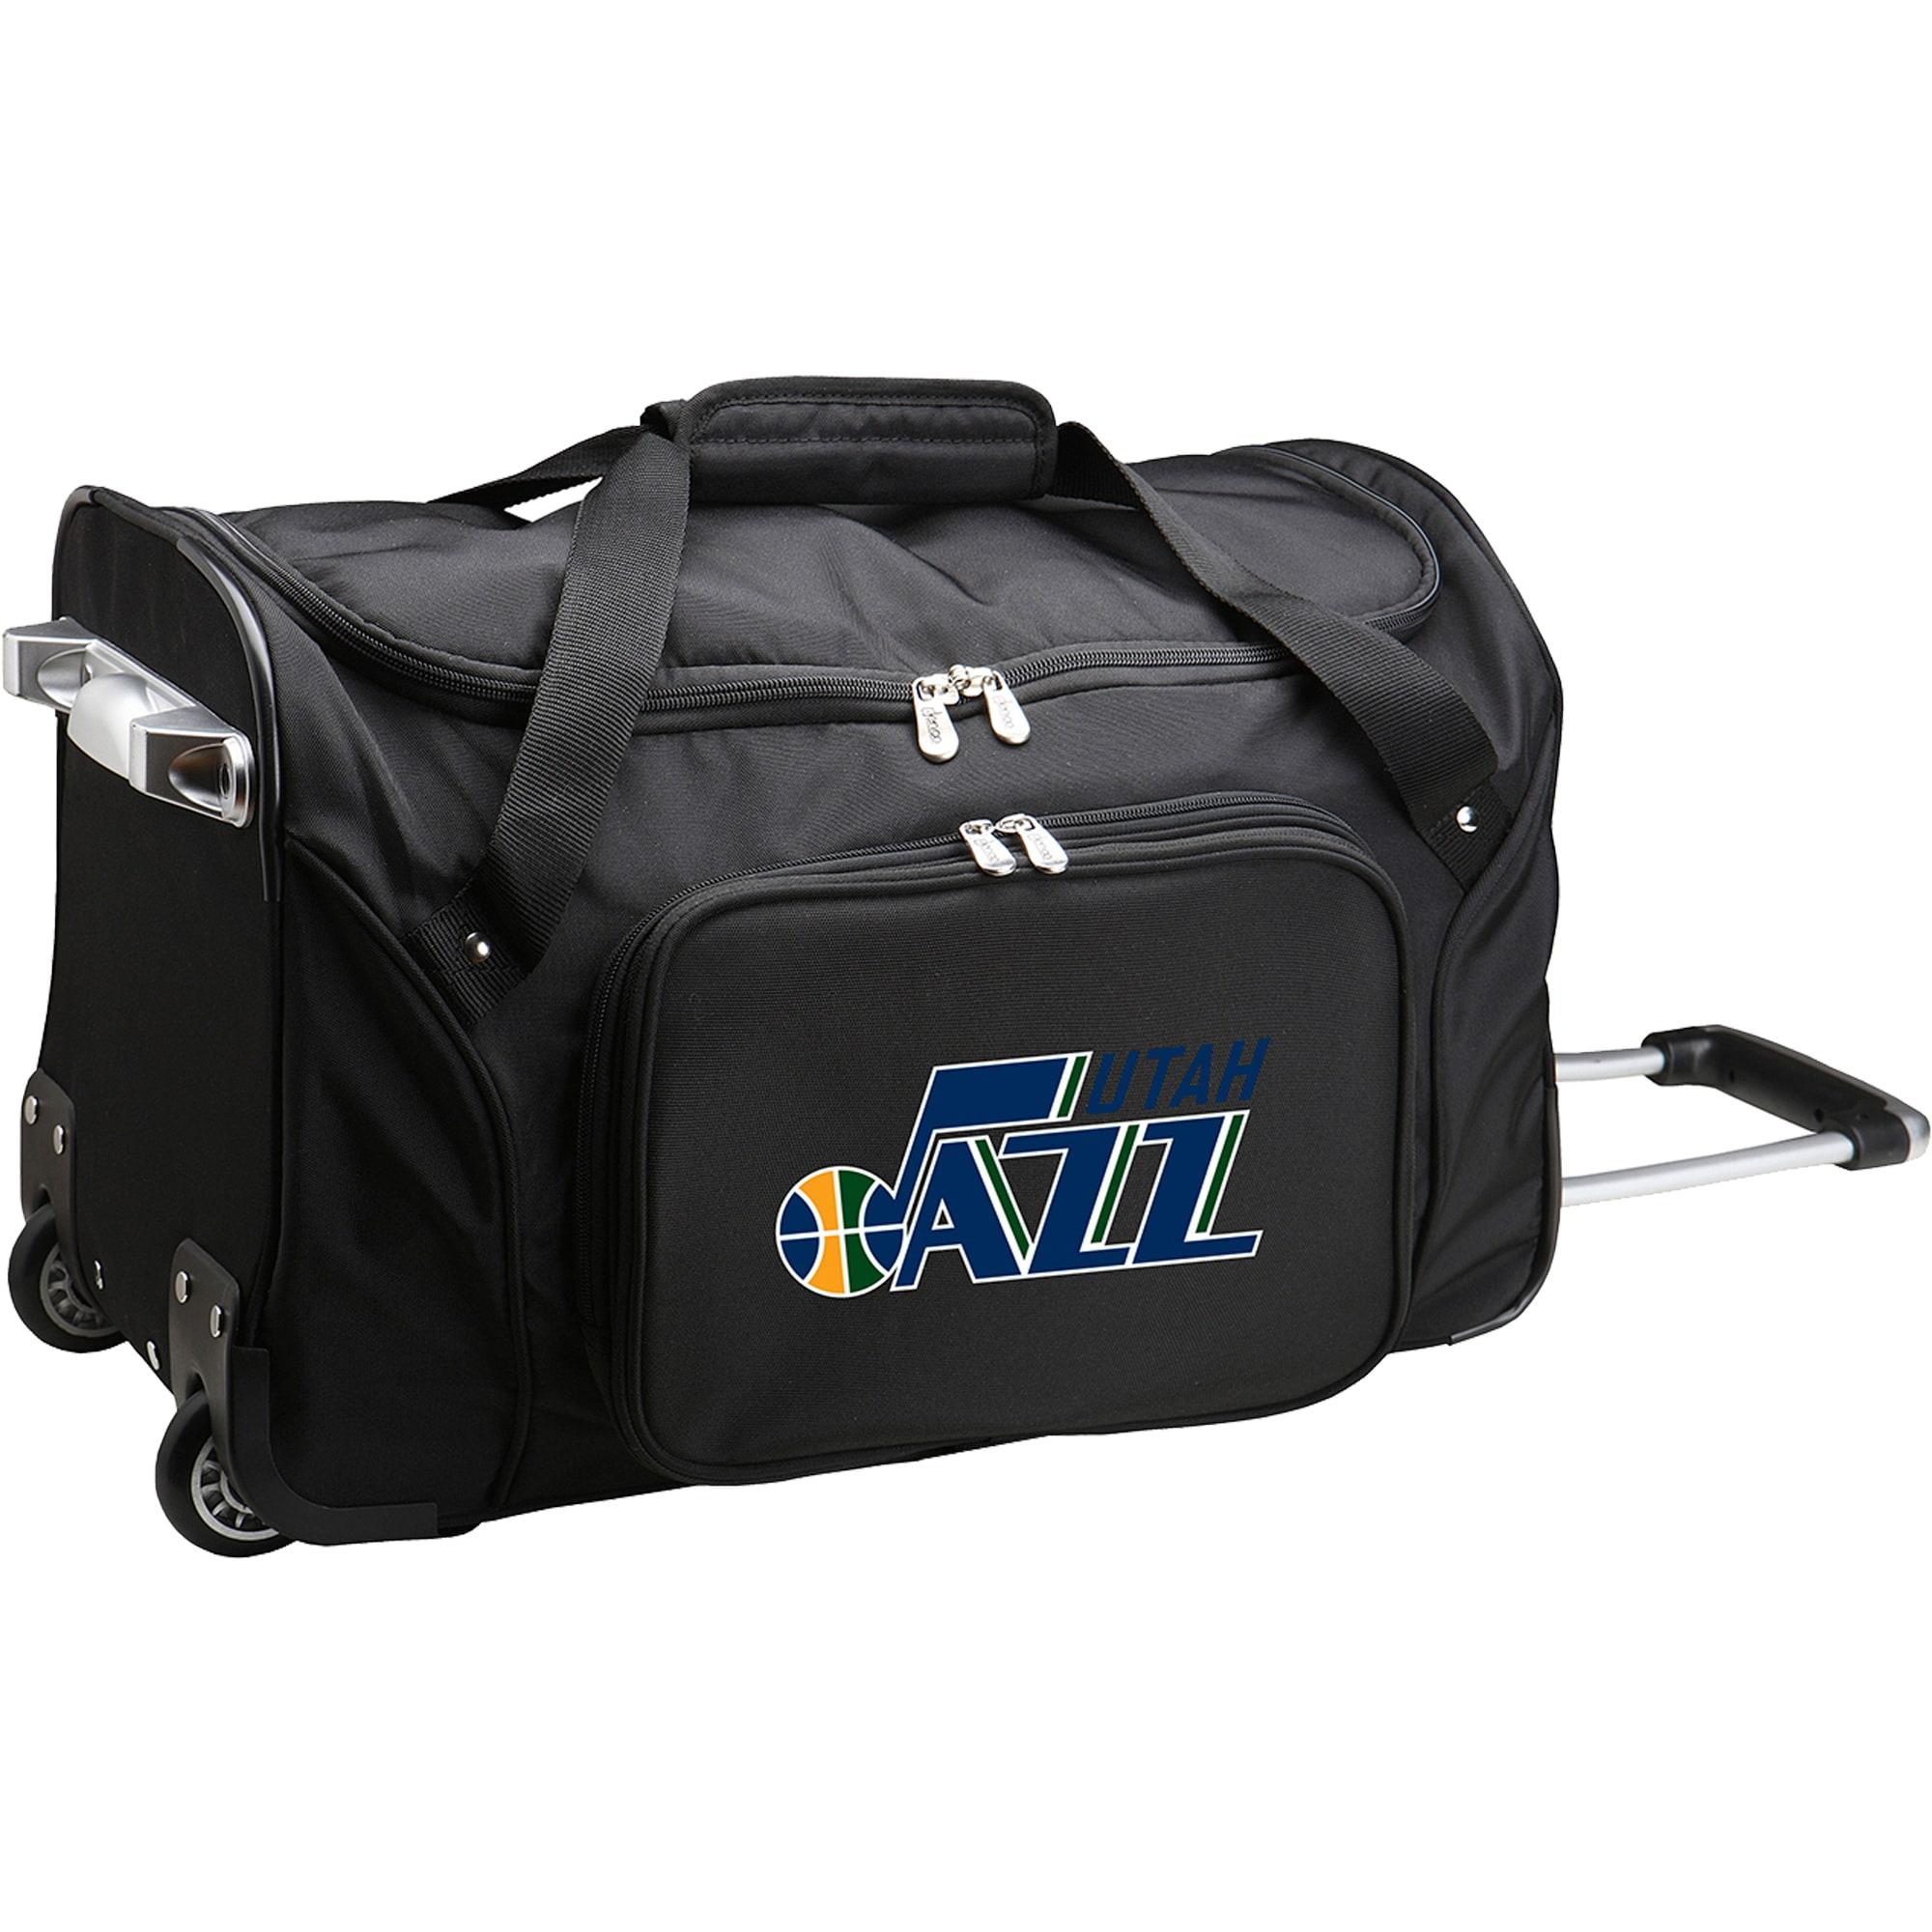 "Utah Jazz 22"" 2-Wheeled Duffel Bag - Black"